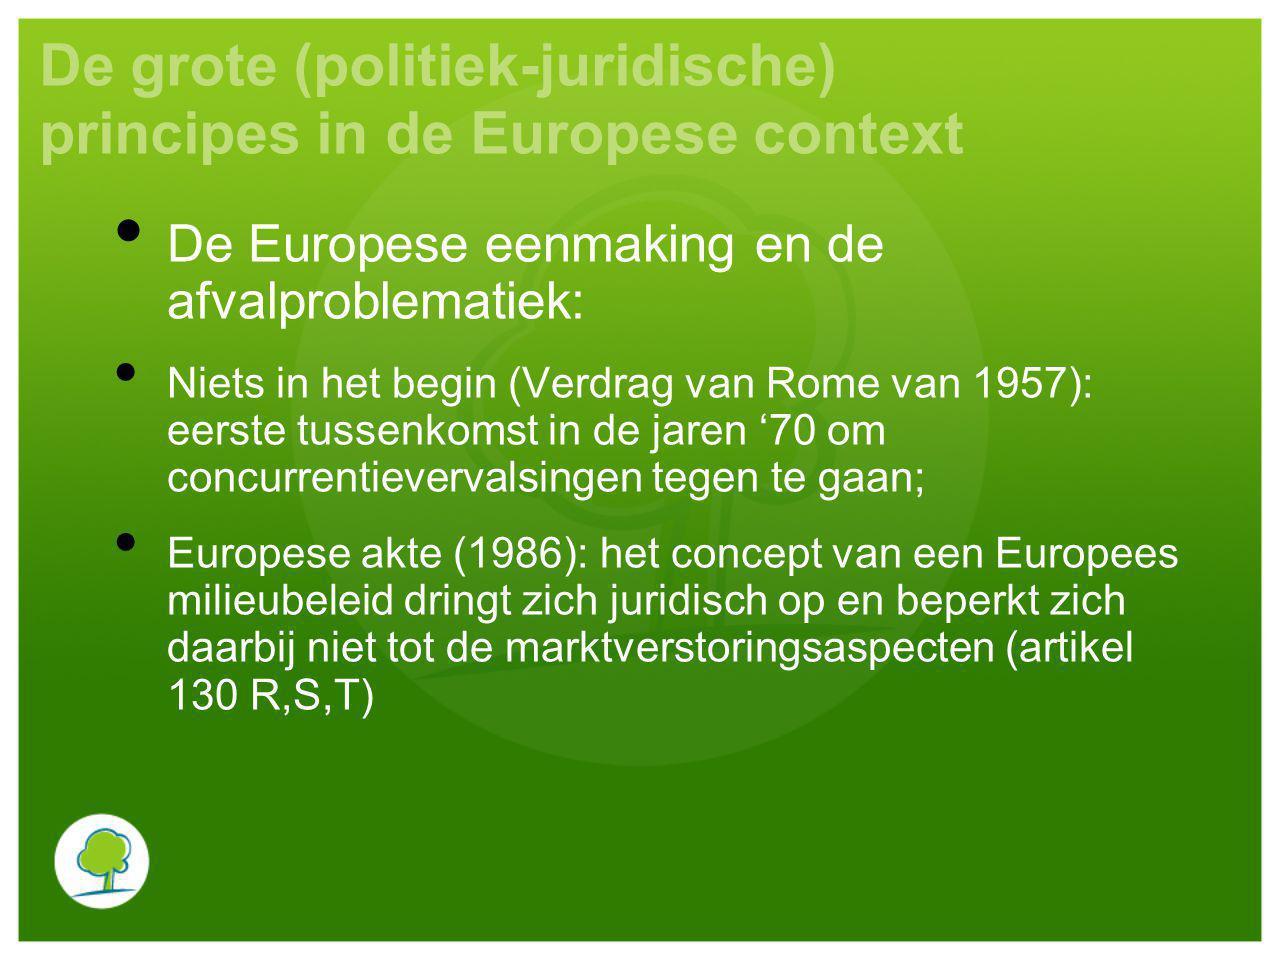 De grote (politiek-juridische) principes in de Europese context